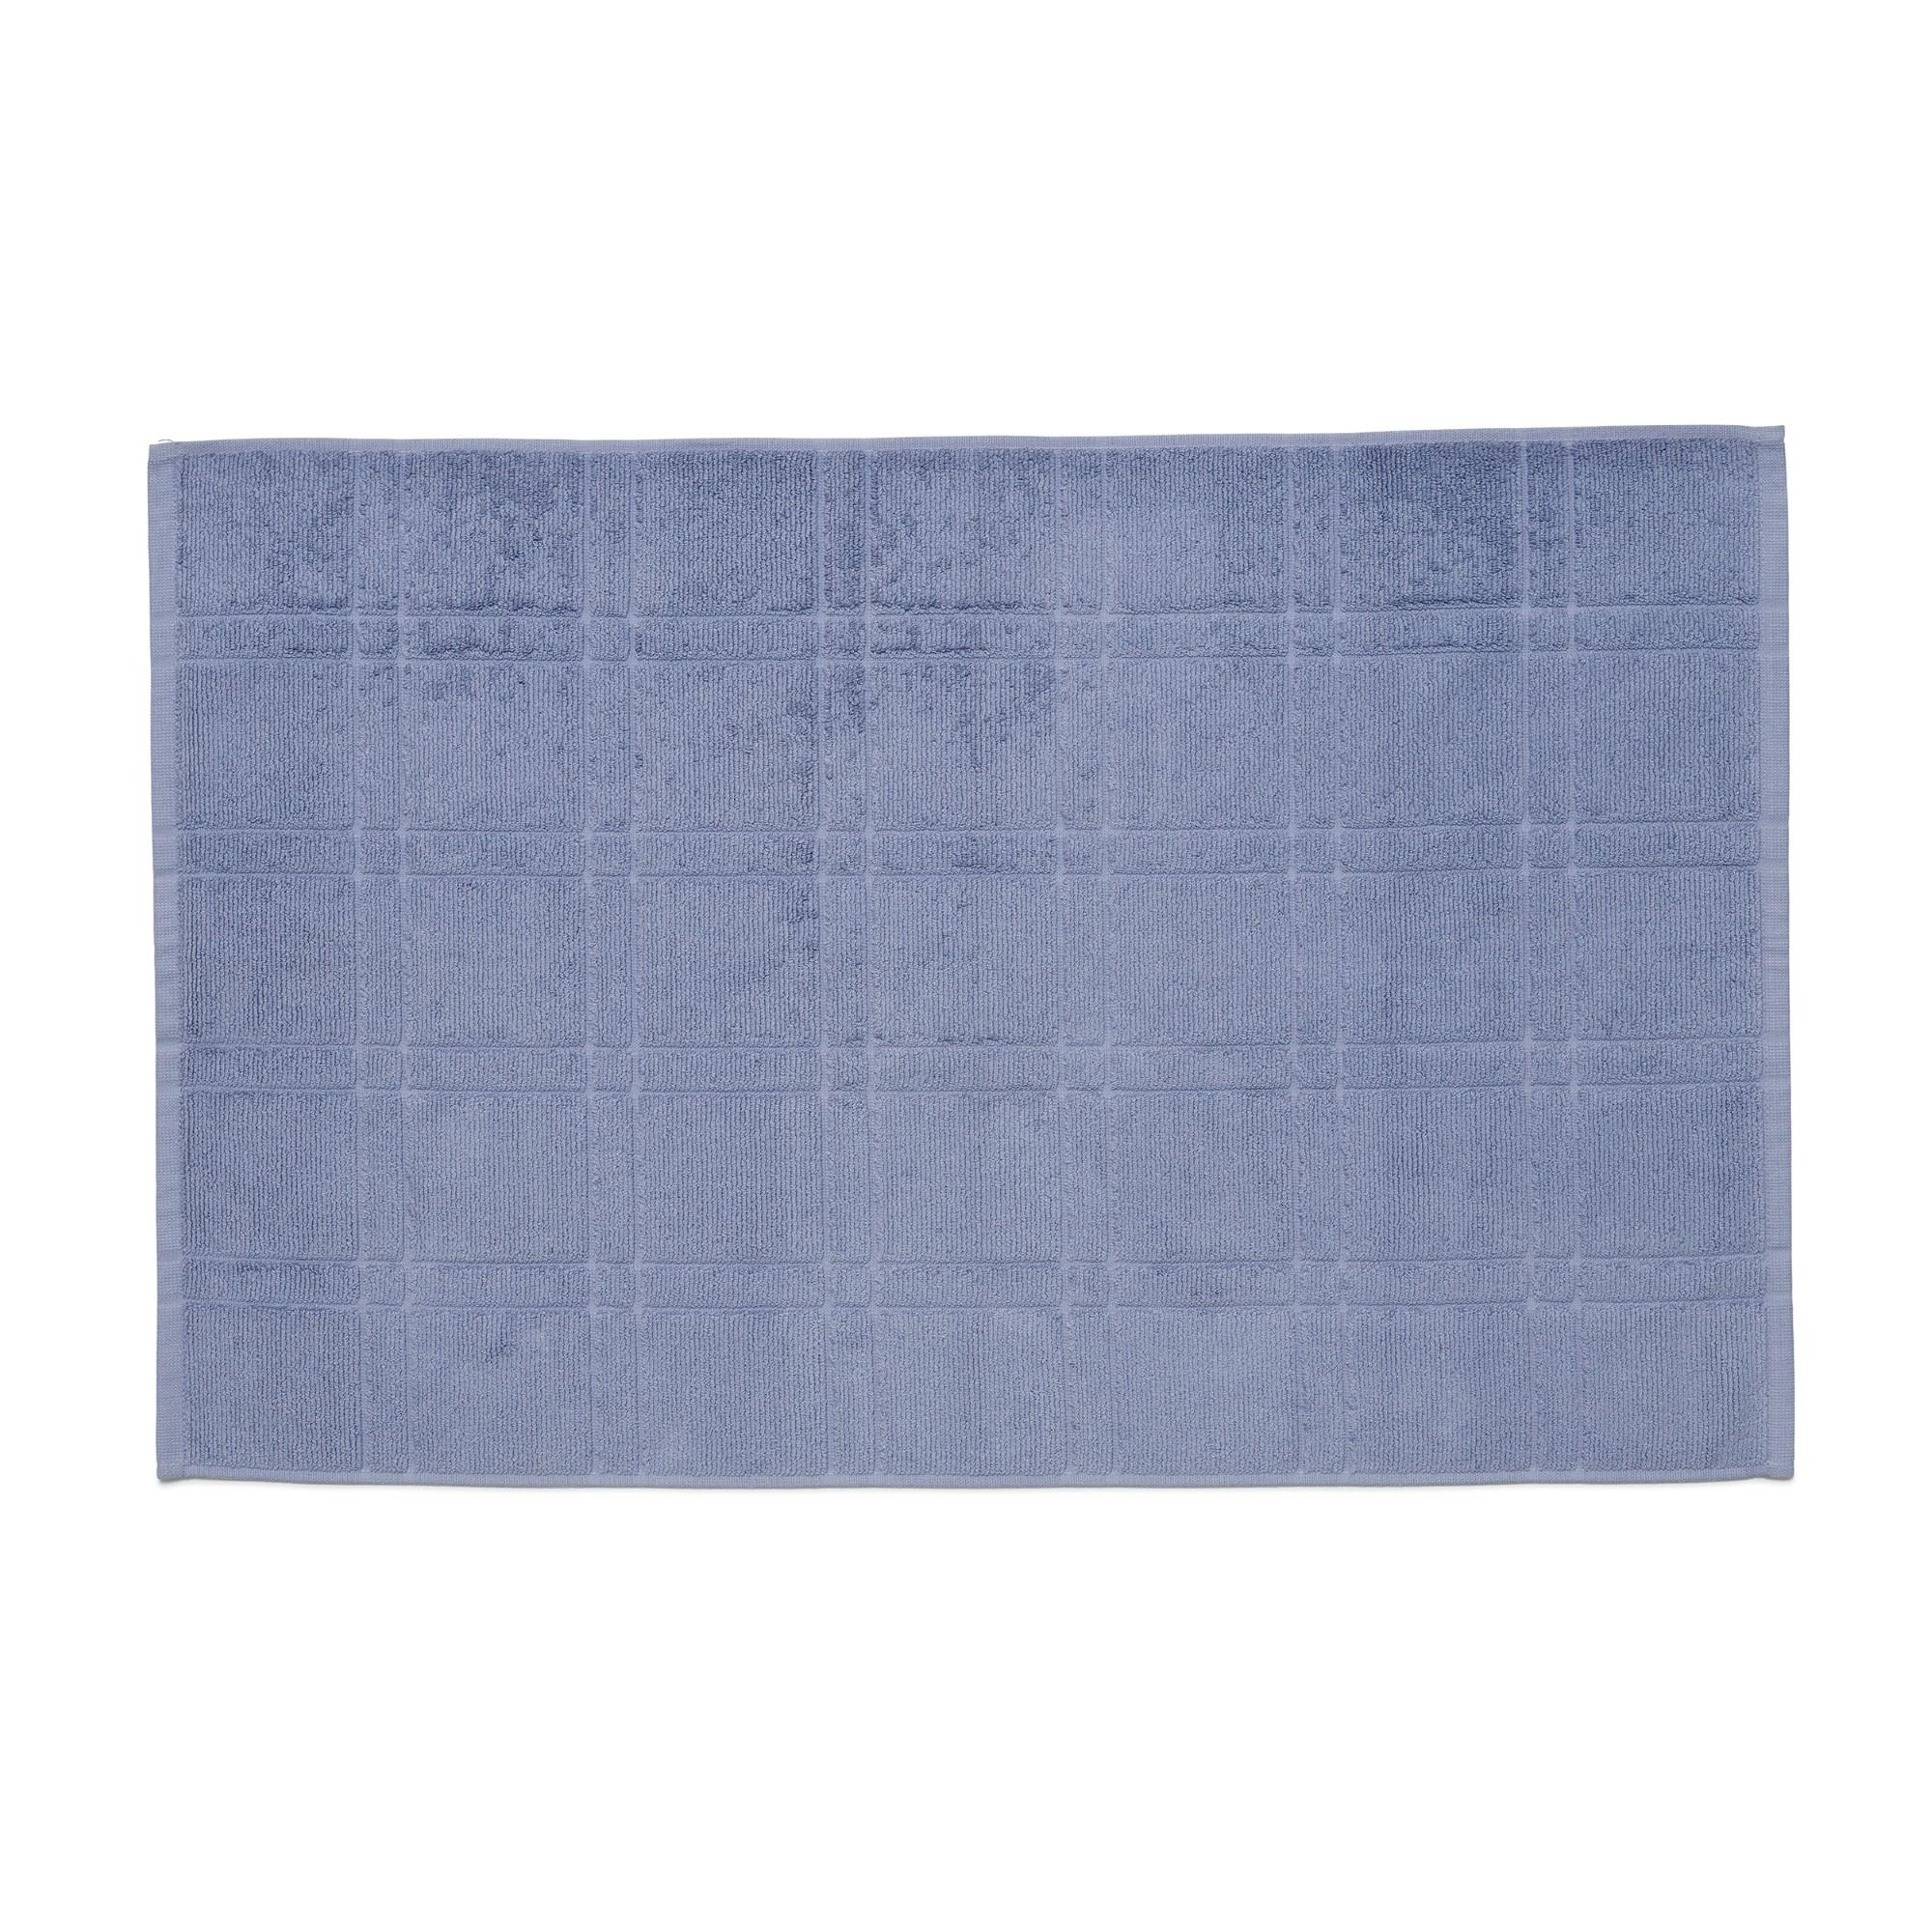 Toalha de Piso Santista Square Felpuda 50x80 cm Antiderrapante 100 Algodao - Azul